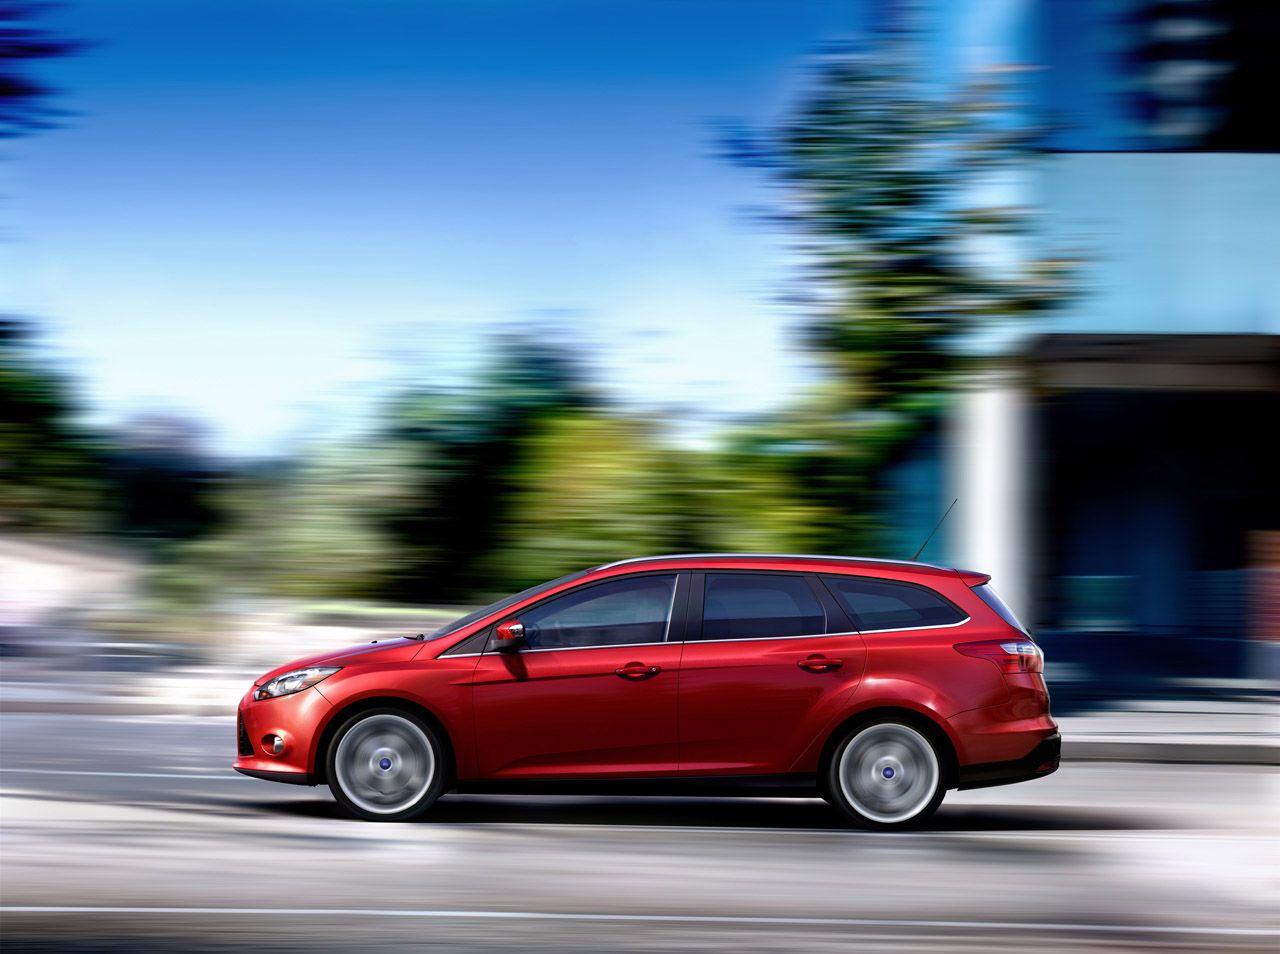 new 2012 ford focus wagon  u0026 5dr hatchback live unveiling at geneva motor show  photos